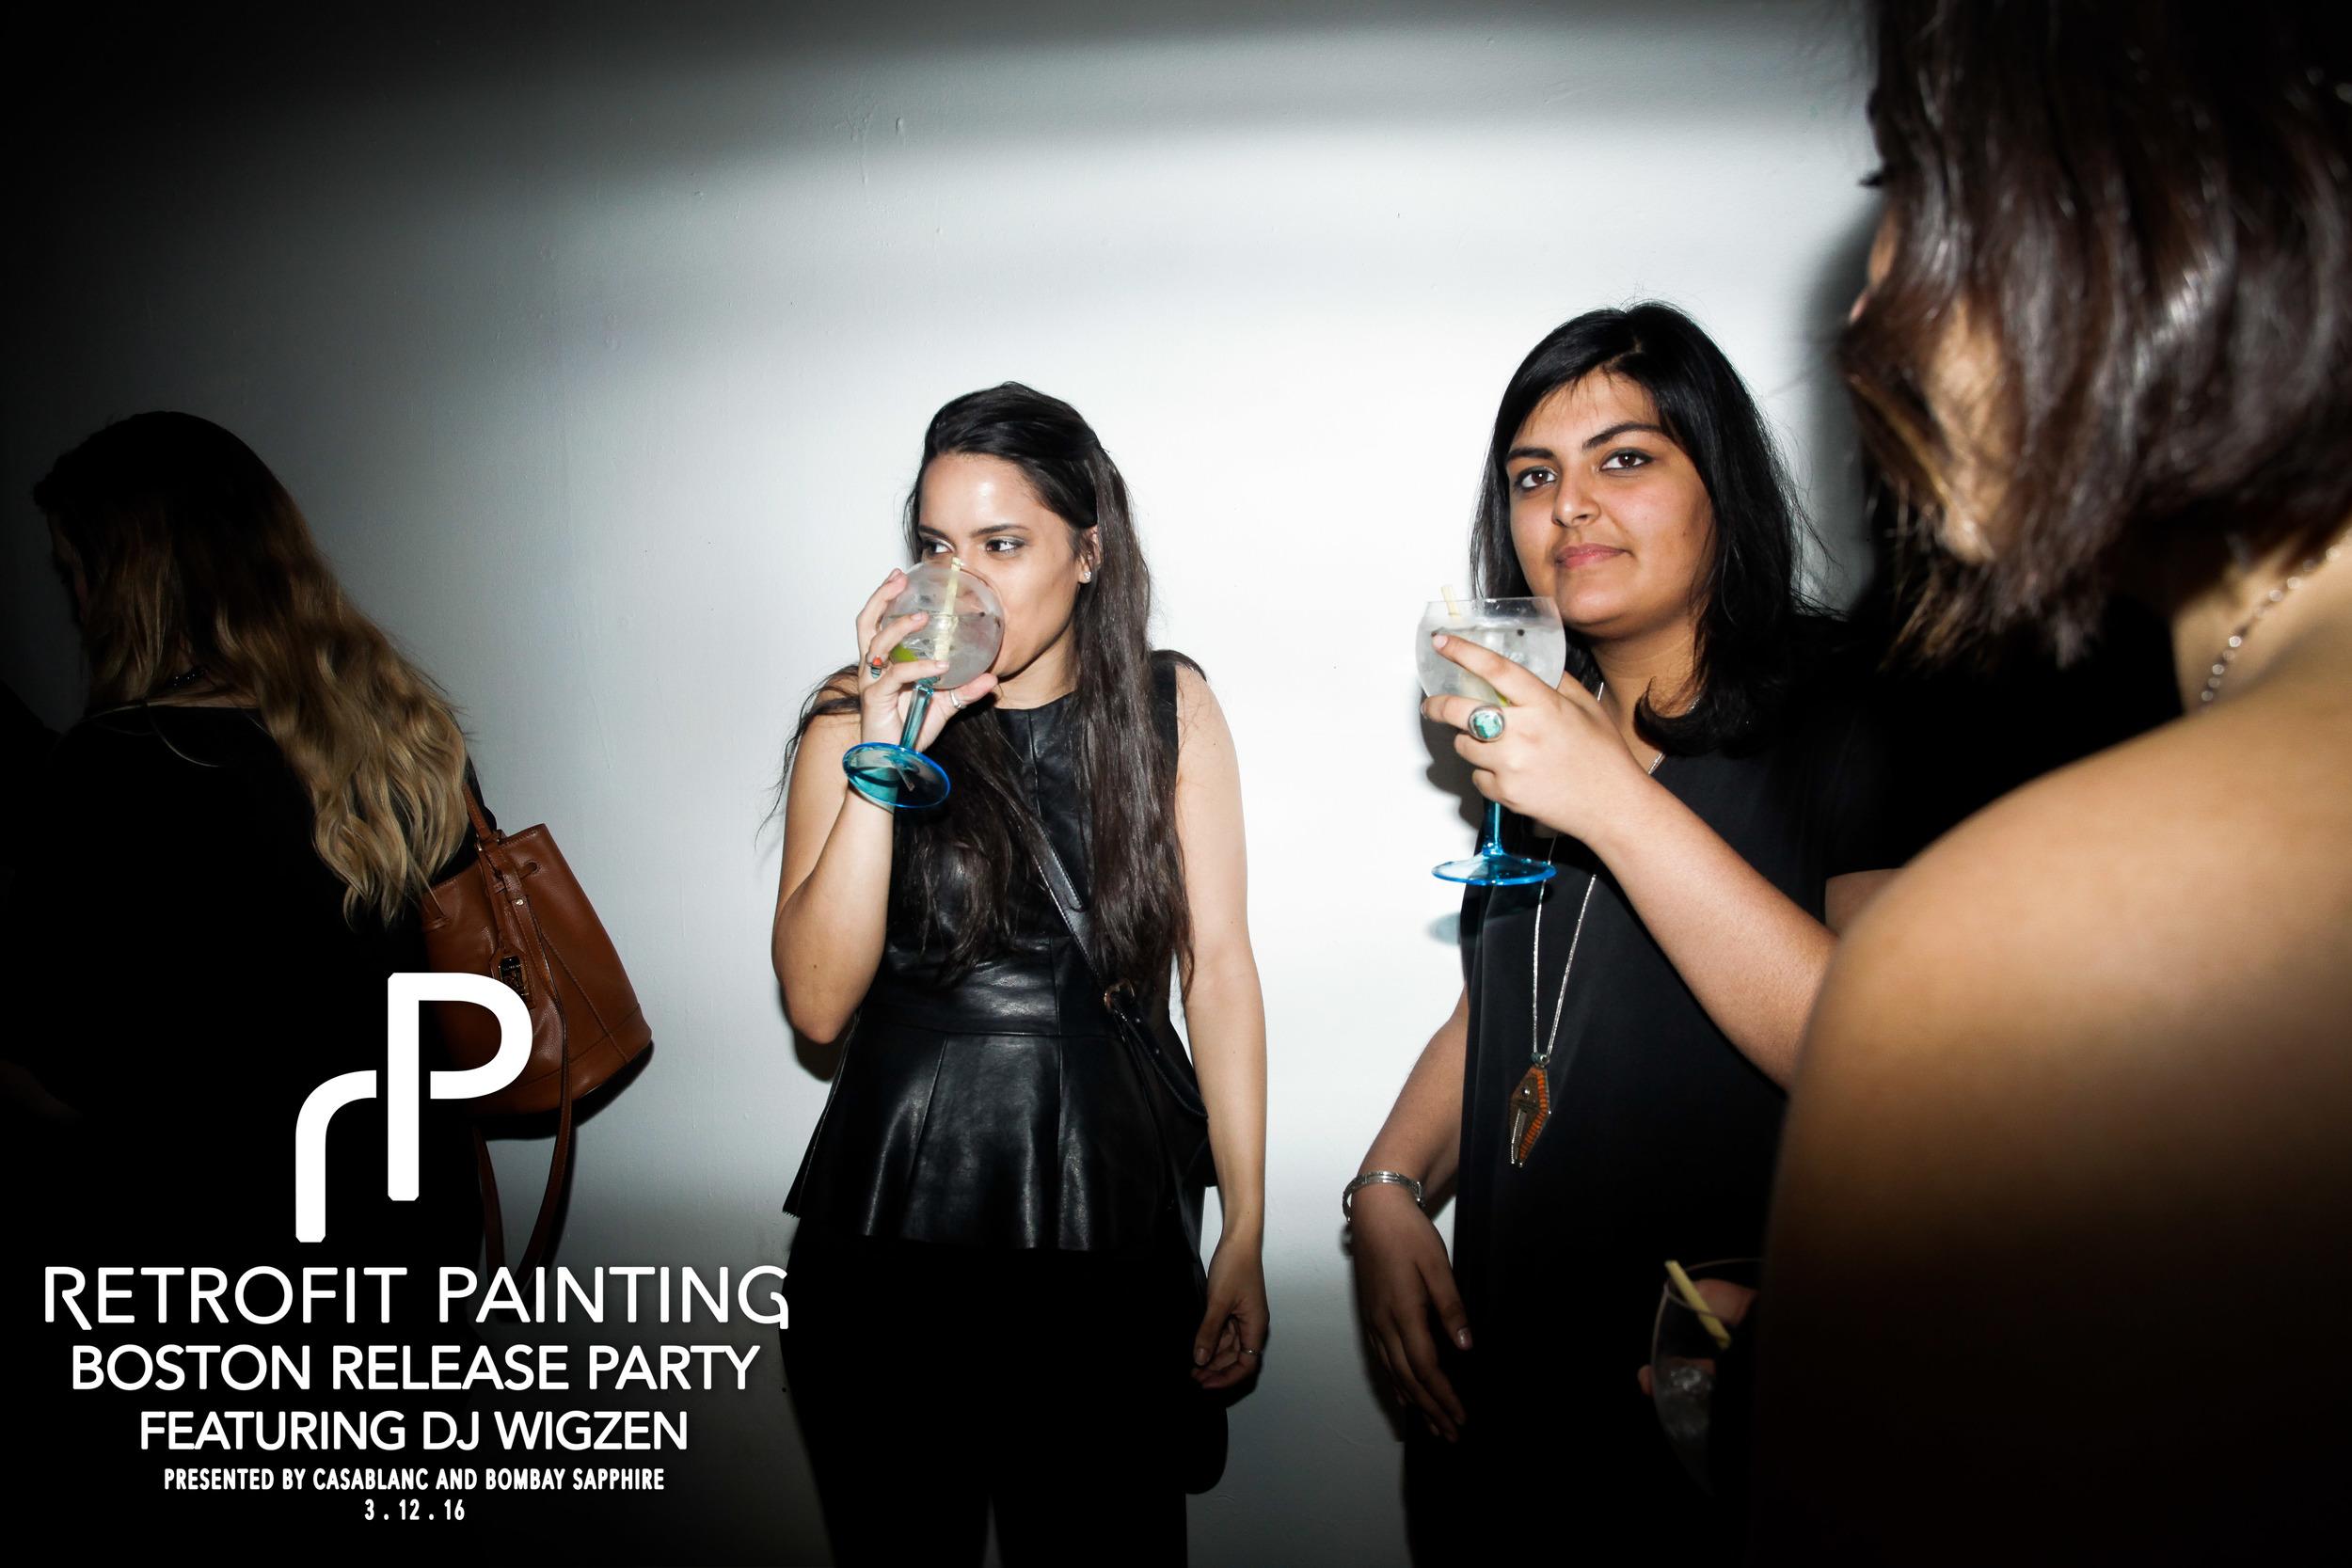 Retrofit Painting Boston Release Party 0030.jpg